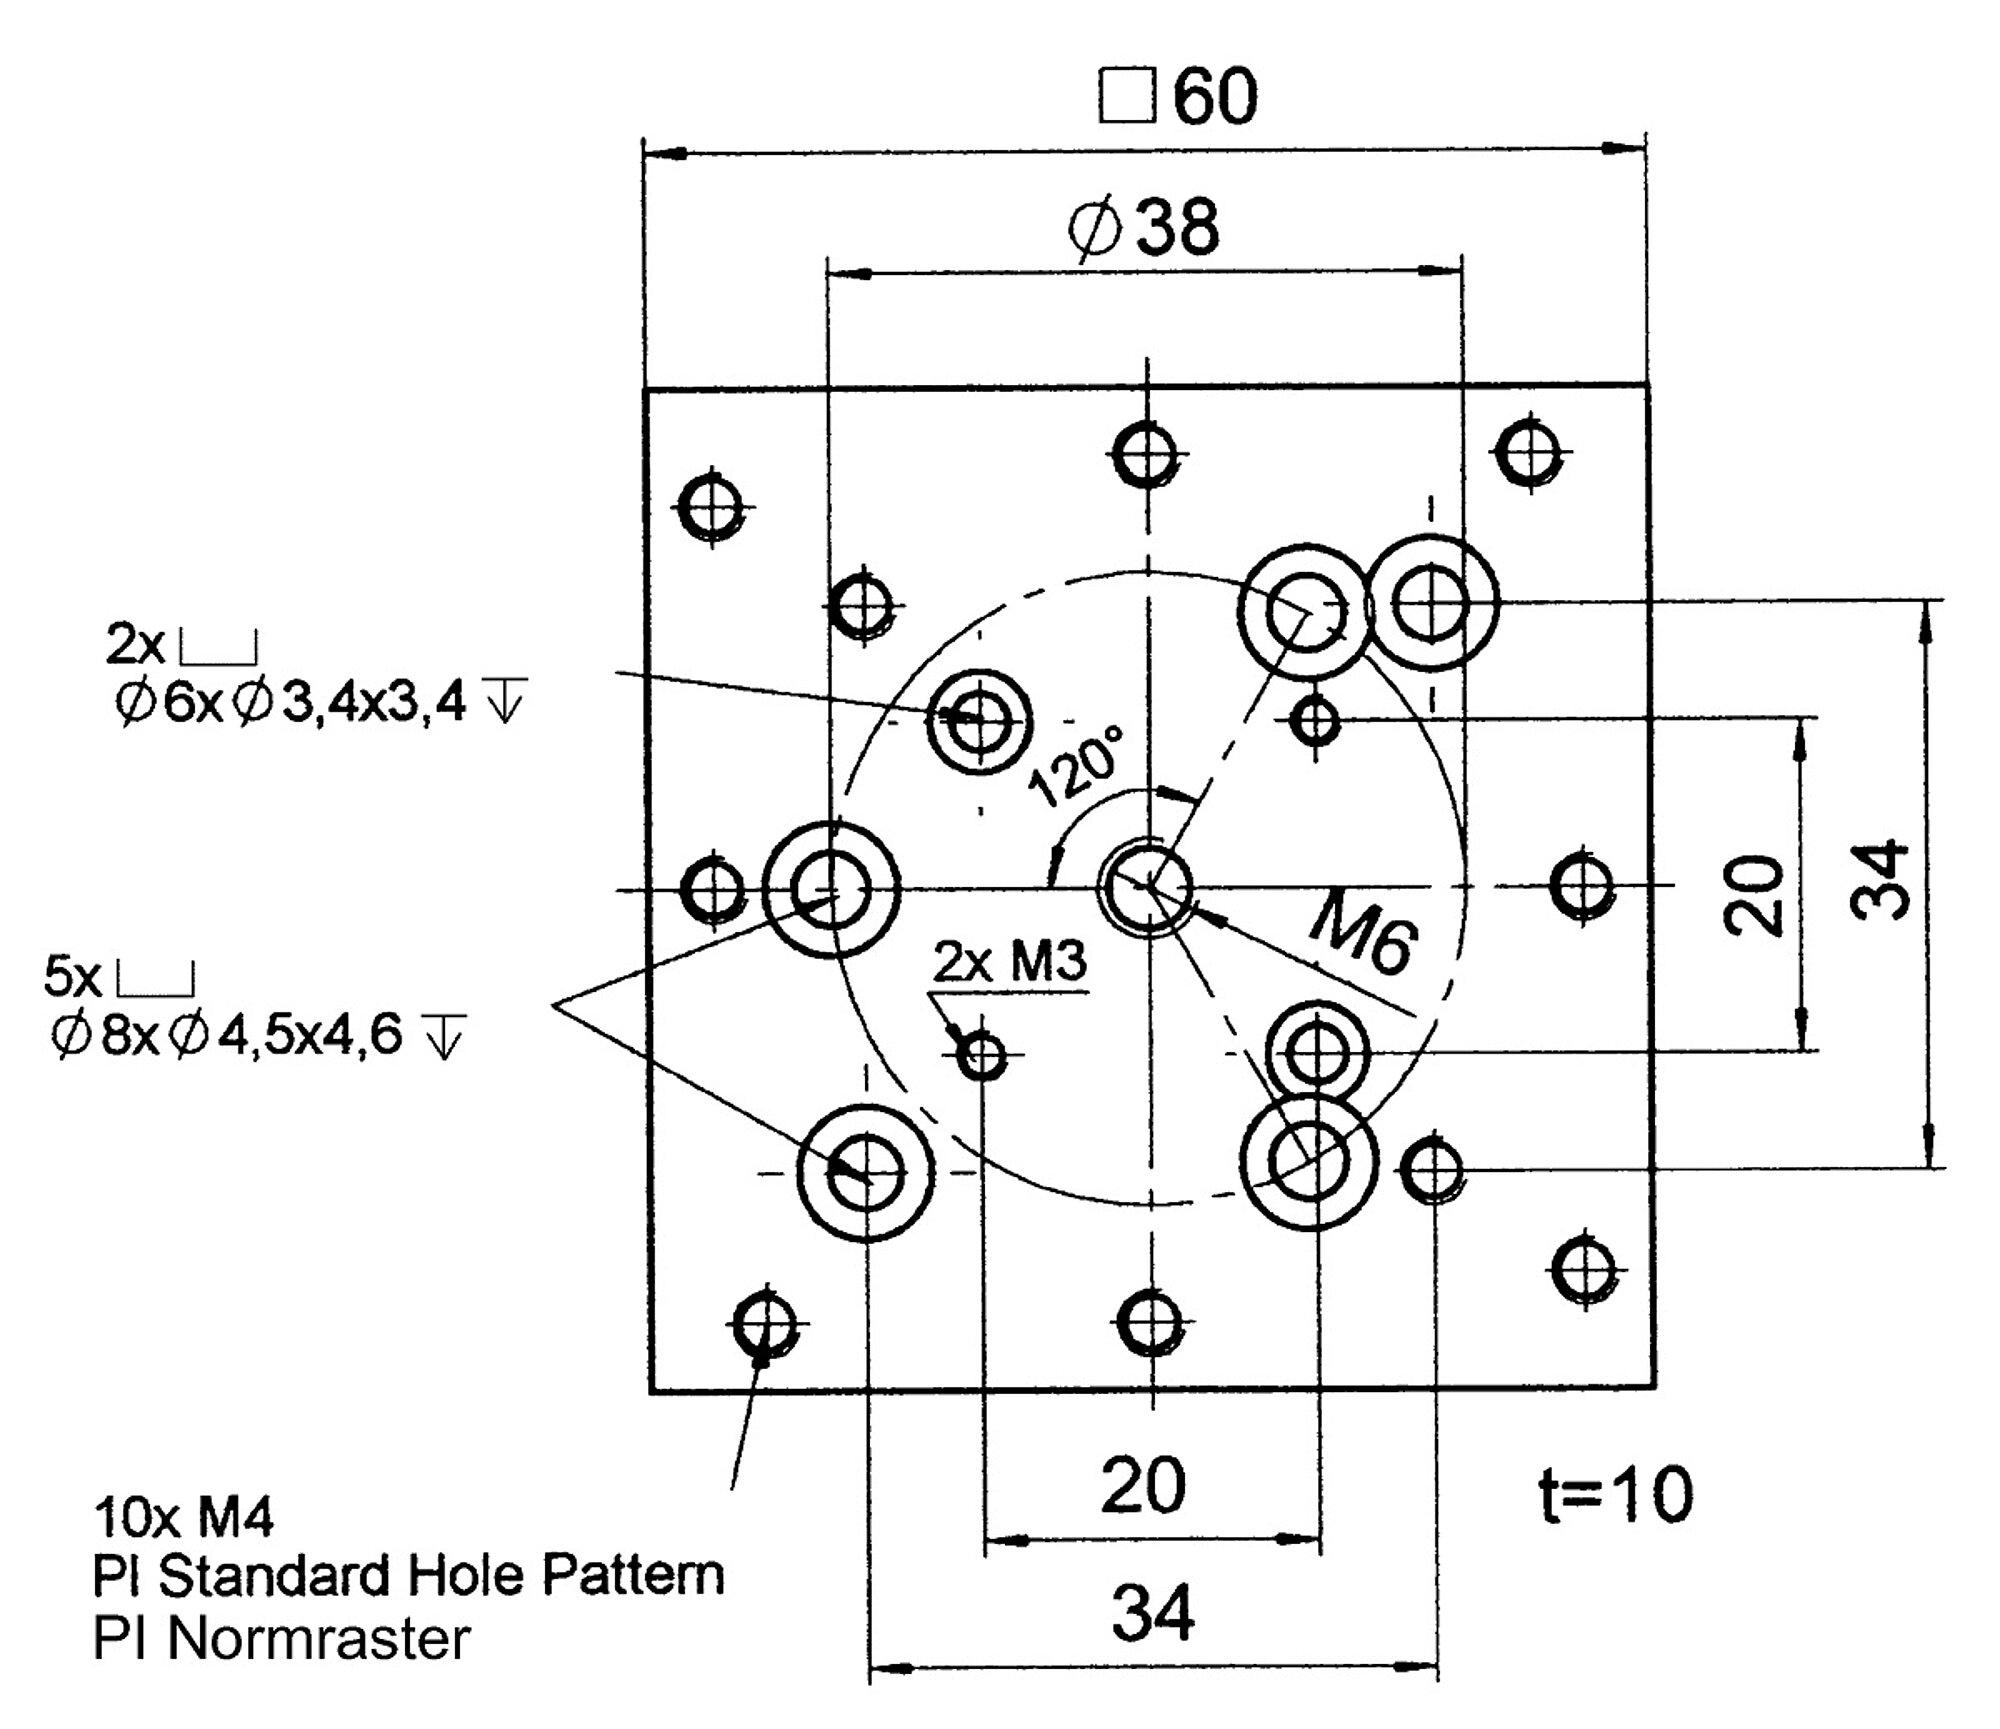 M-105 AP Adapter Plate